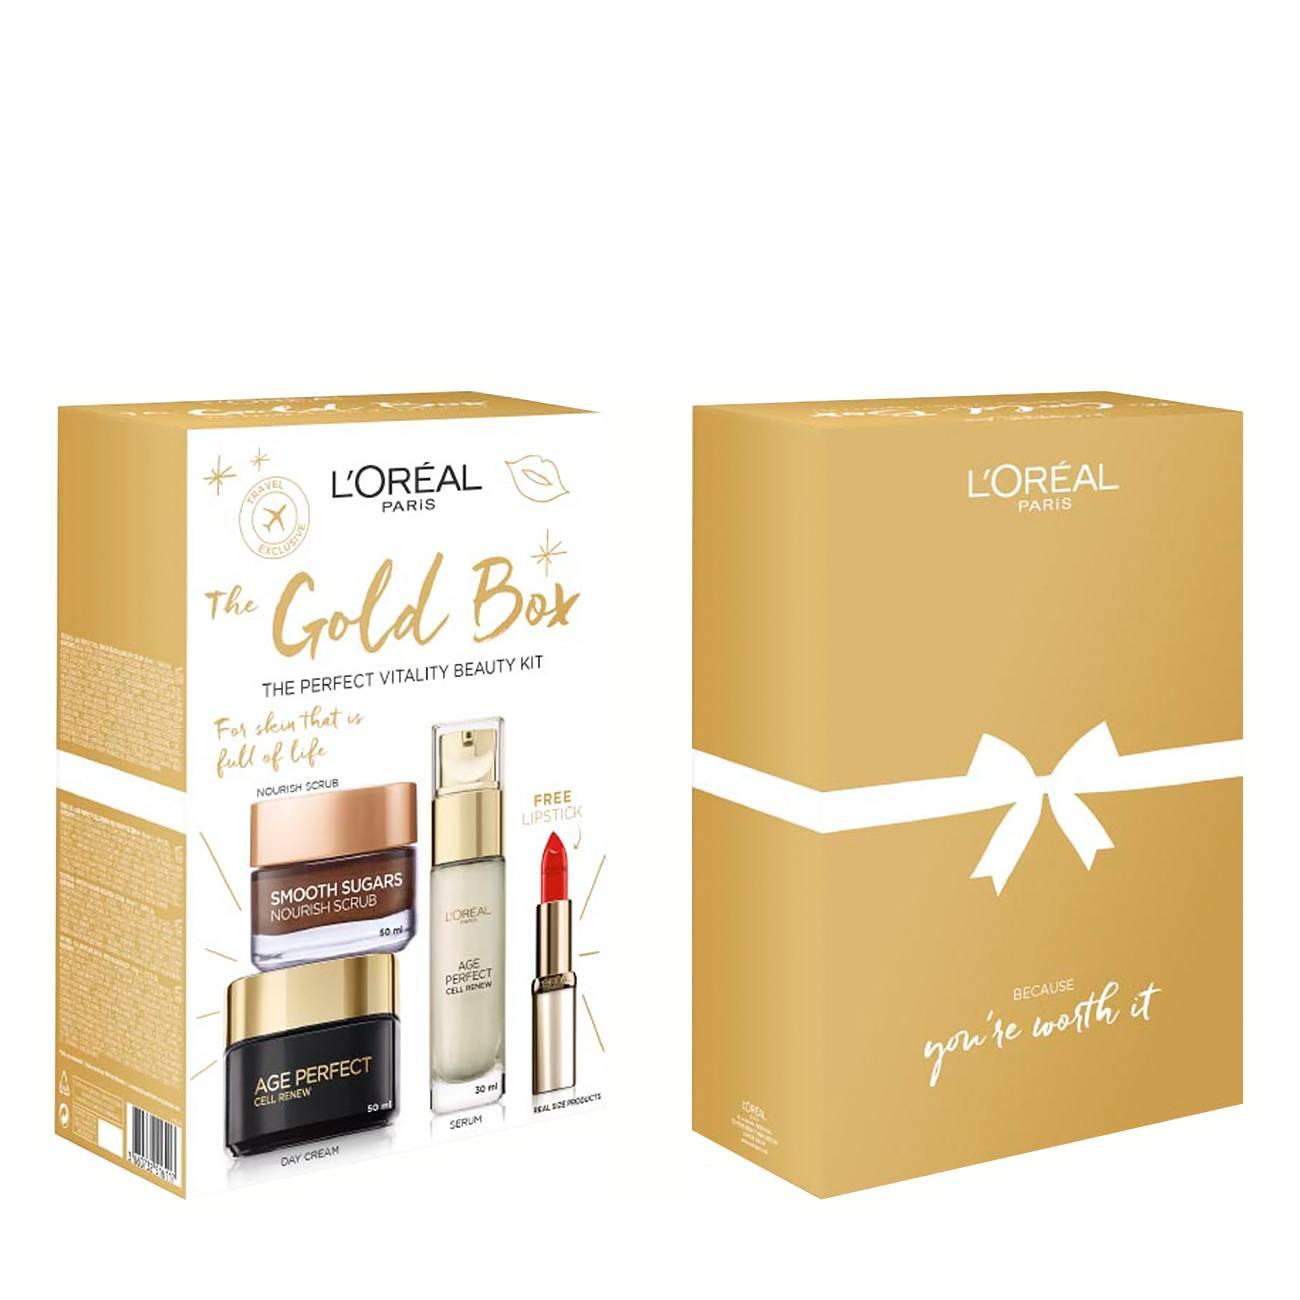 Age Perfect The Gold Box Set 130ml L'Oreal imagine 2021 bestvalue.eu